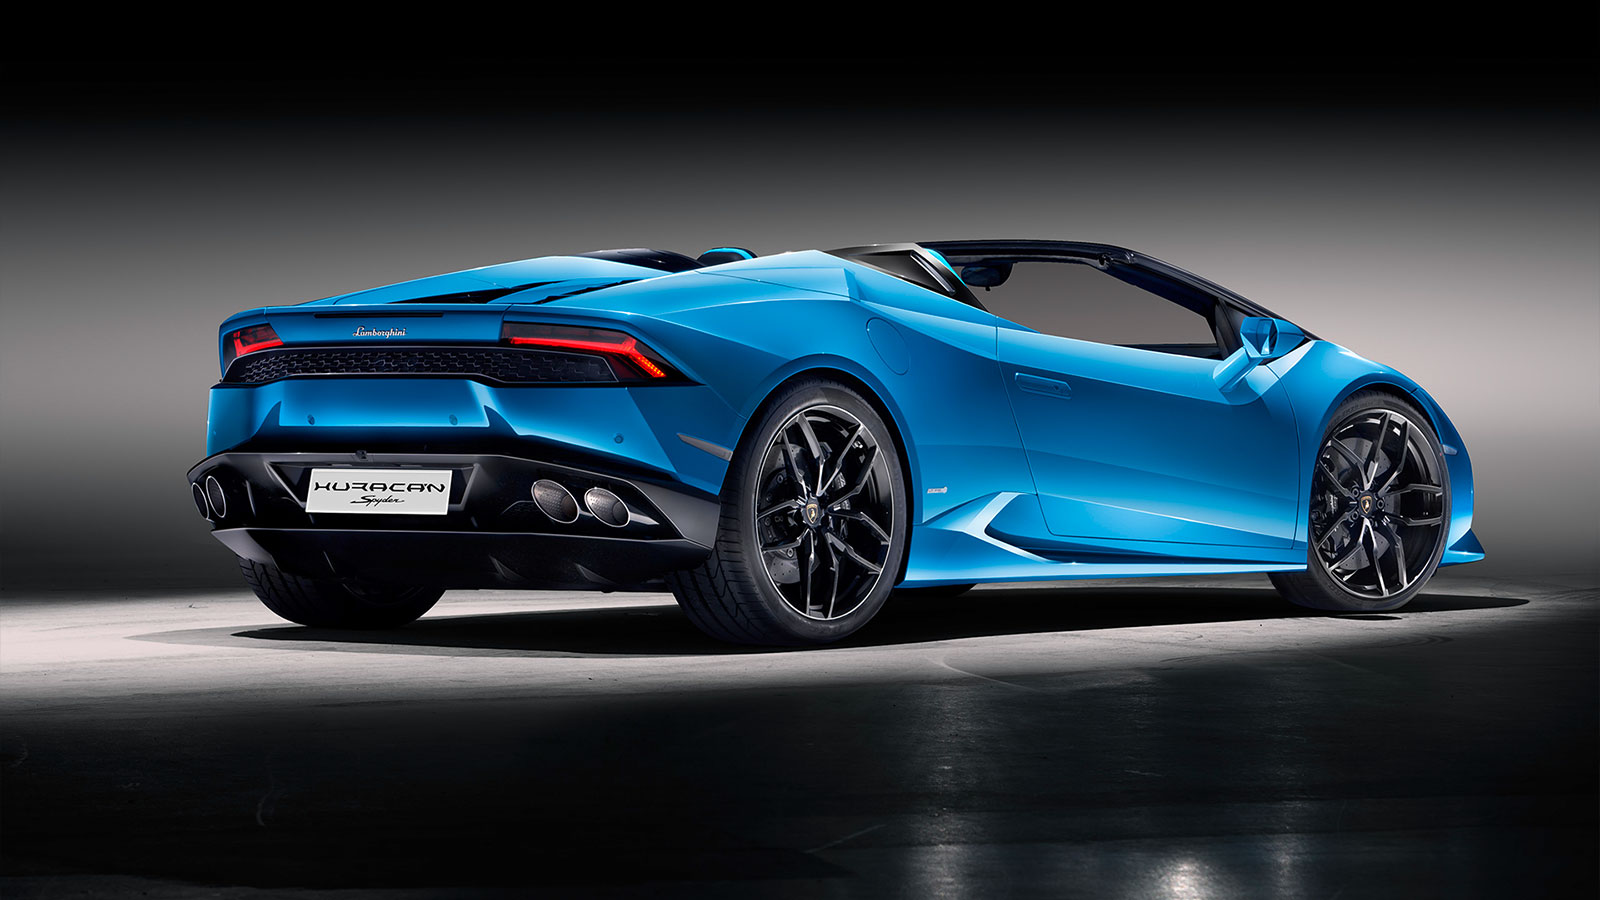 Lamborghini Huracan AWD Spyder - Inspiring Technology image 11